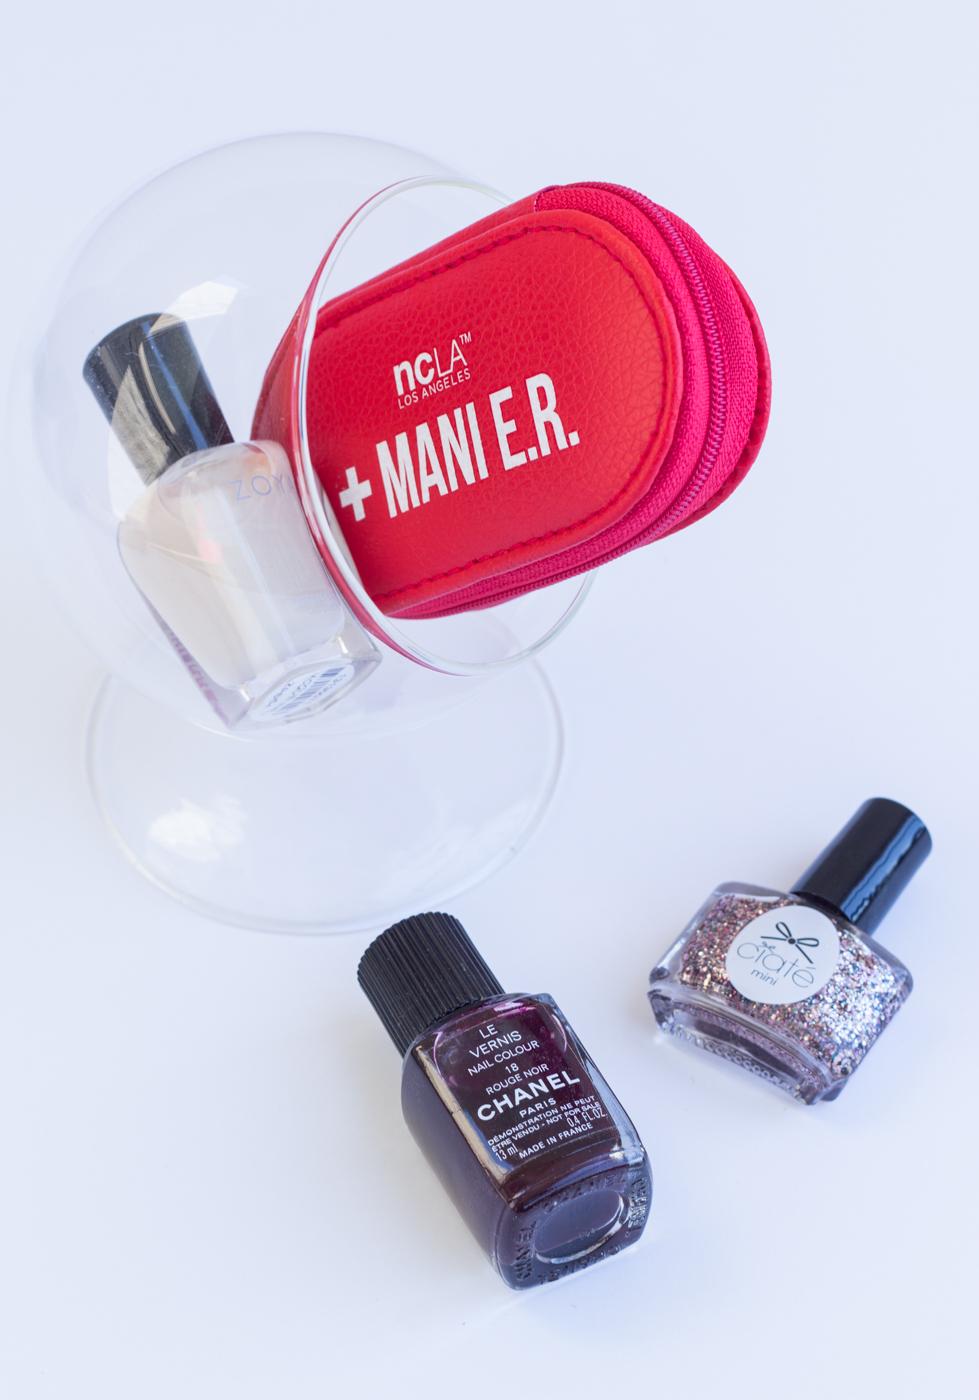 NCLA Mani-ER Tool Kit | The Chic Diary